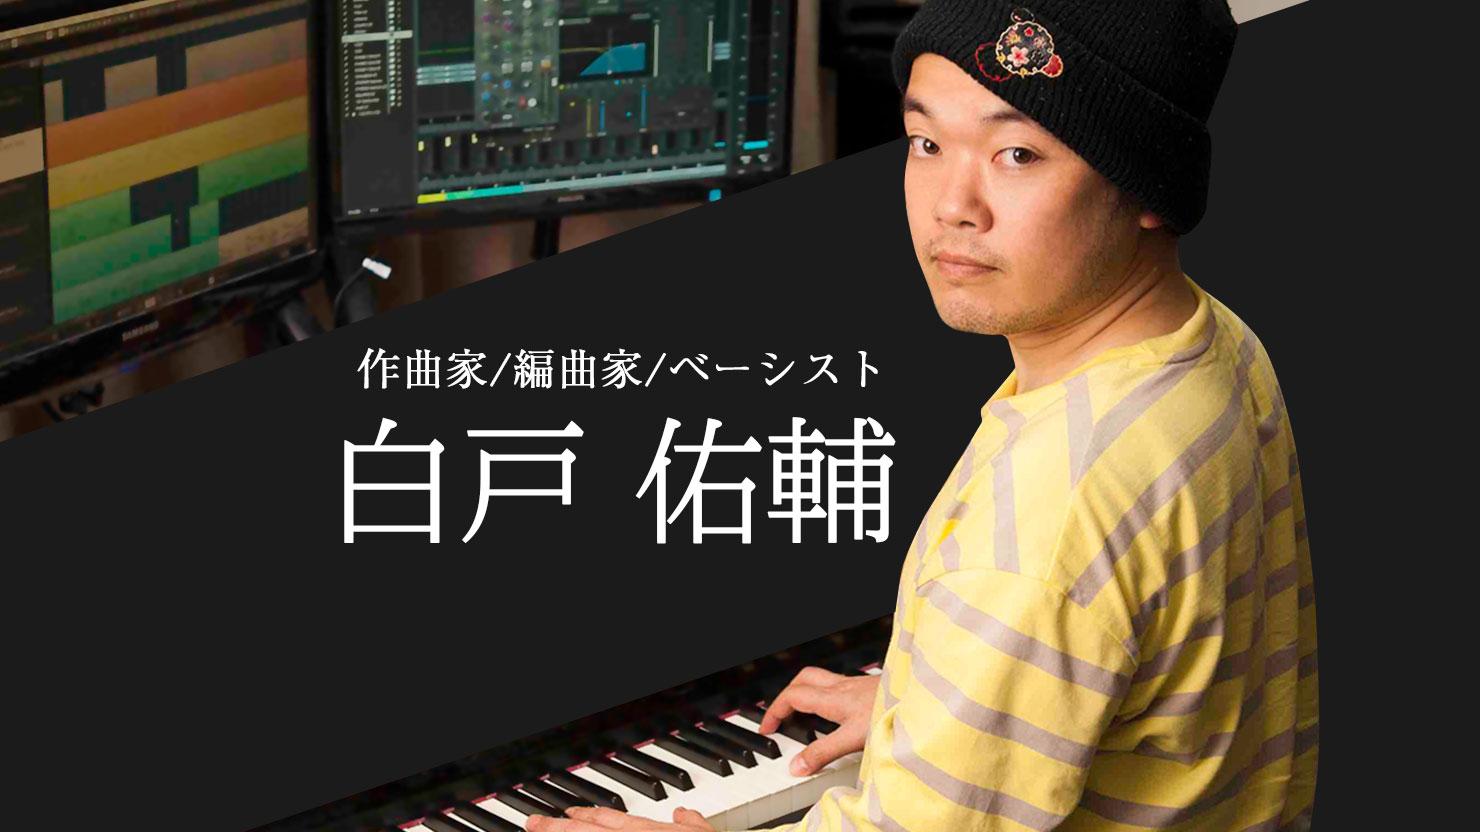 Shirato-Yusuke-Composer-Arranger